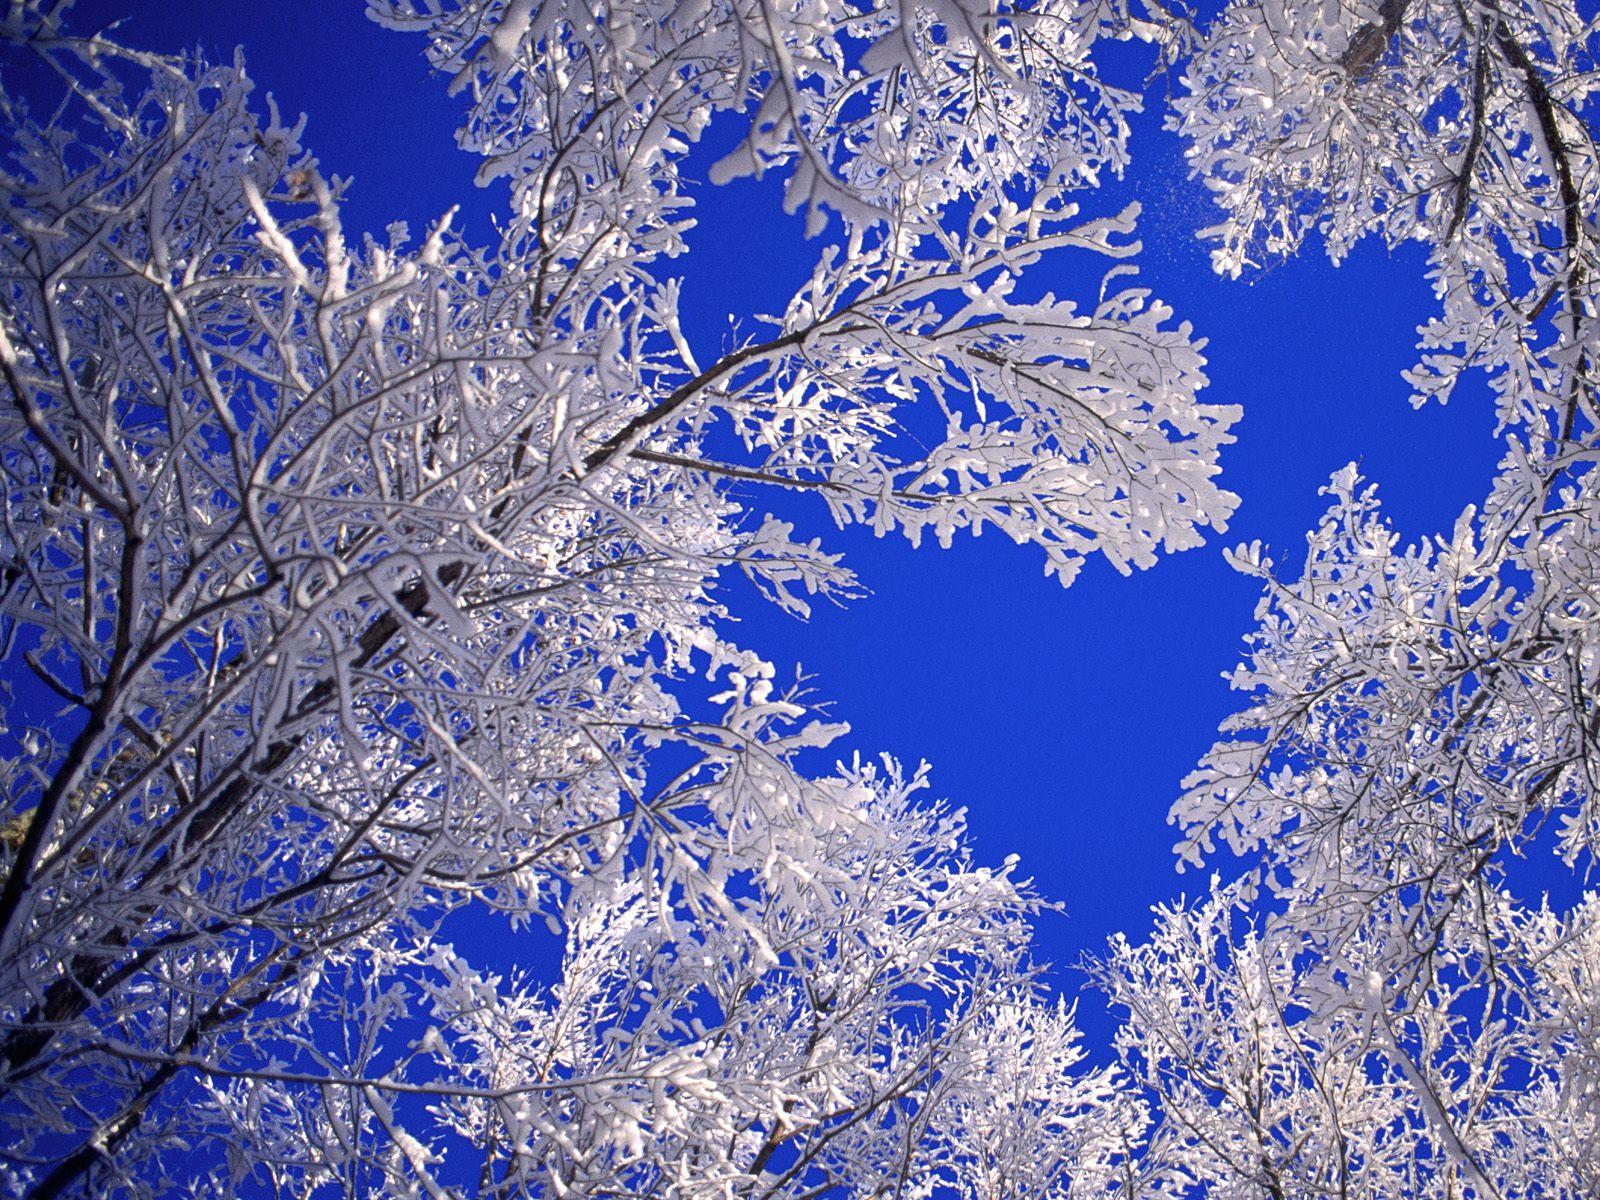 Desktop Wallpaper Winter Scene Winter Scene Modern FHDQ 1600x1200 1600x1200